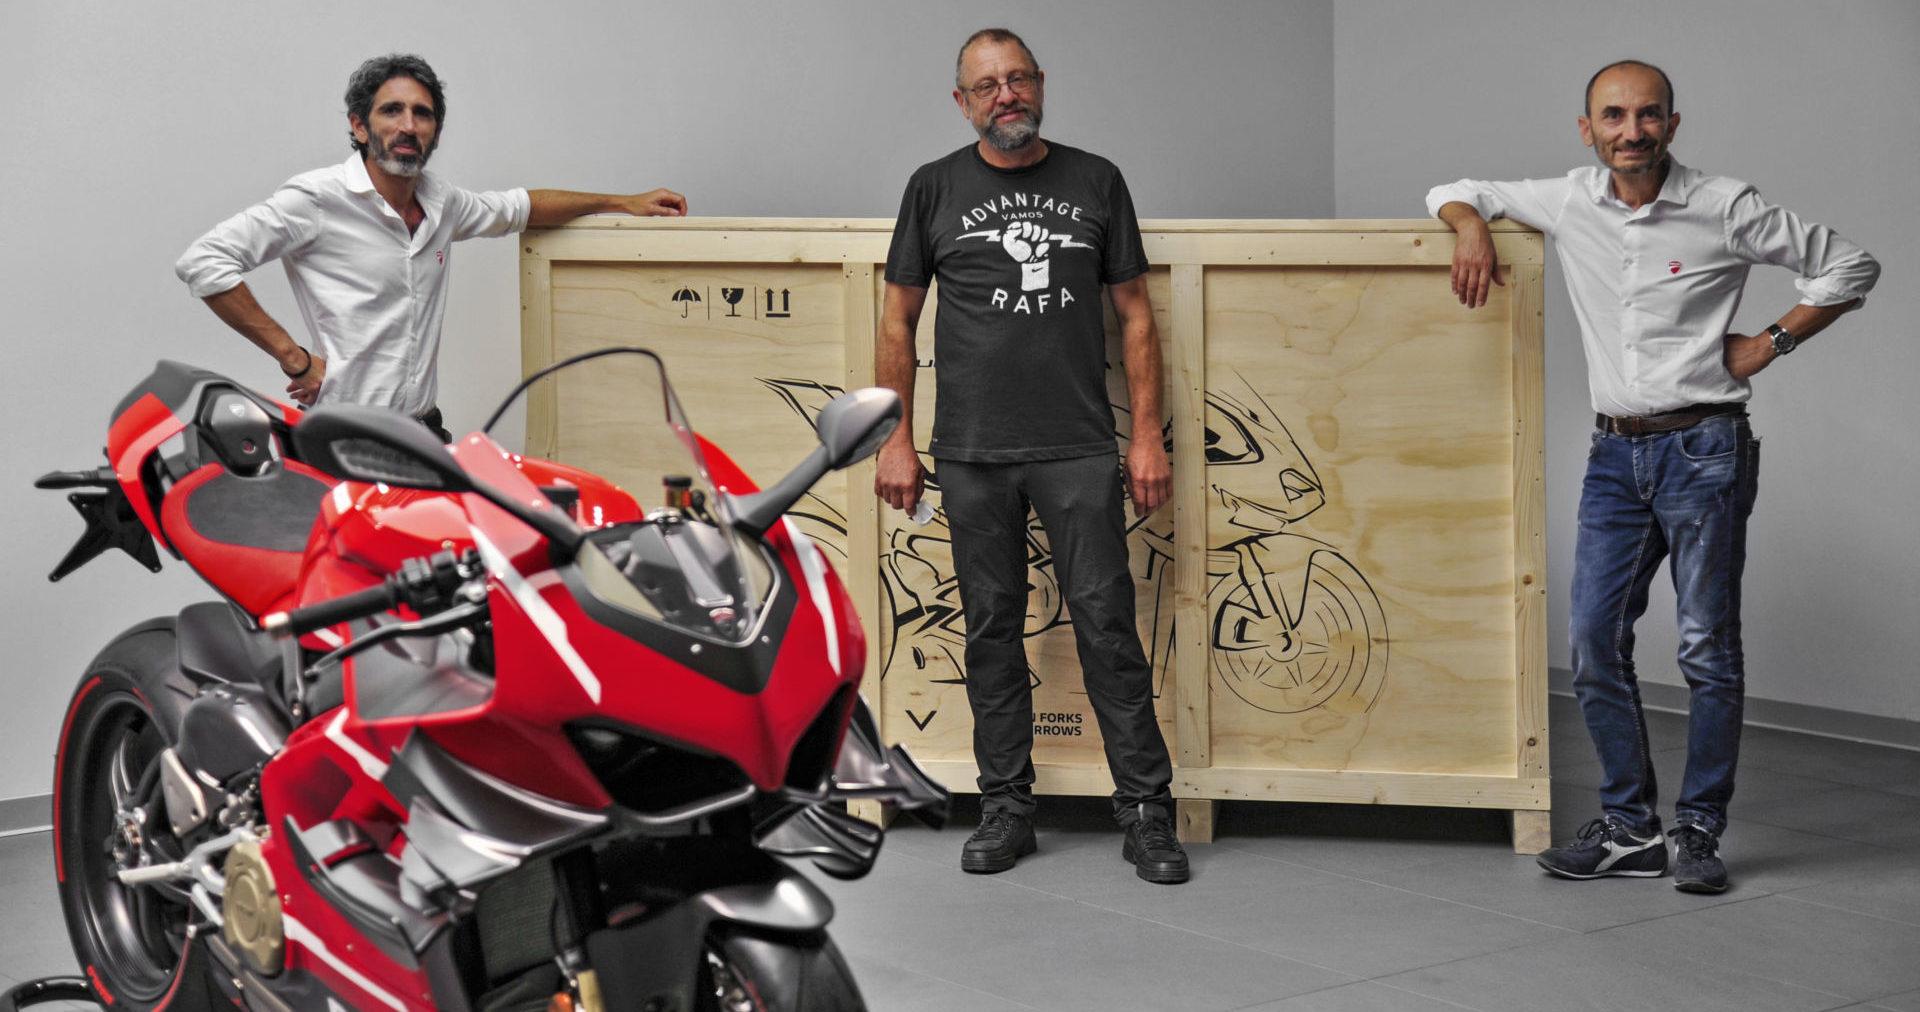 Ducati VP Global Sales and After Sales Francesco Milicia (left) and Ducati CEO Claudio Domenicali (right) deliver Superleggera V4 #001 to Ducatista Filip Van Schil (center) at the Ducati factory in Italy. Photo courtesy Ducati.